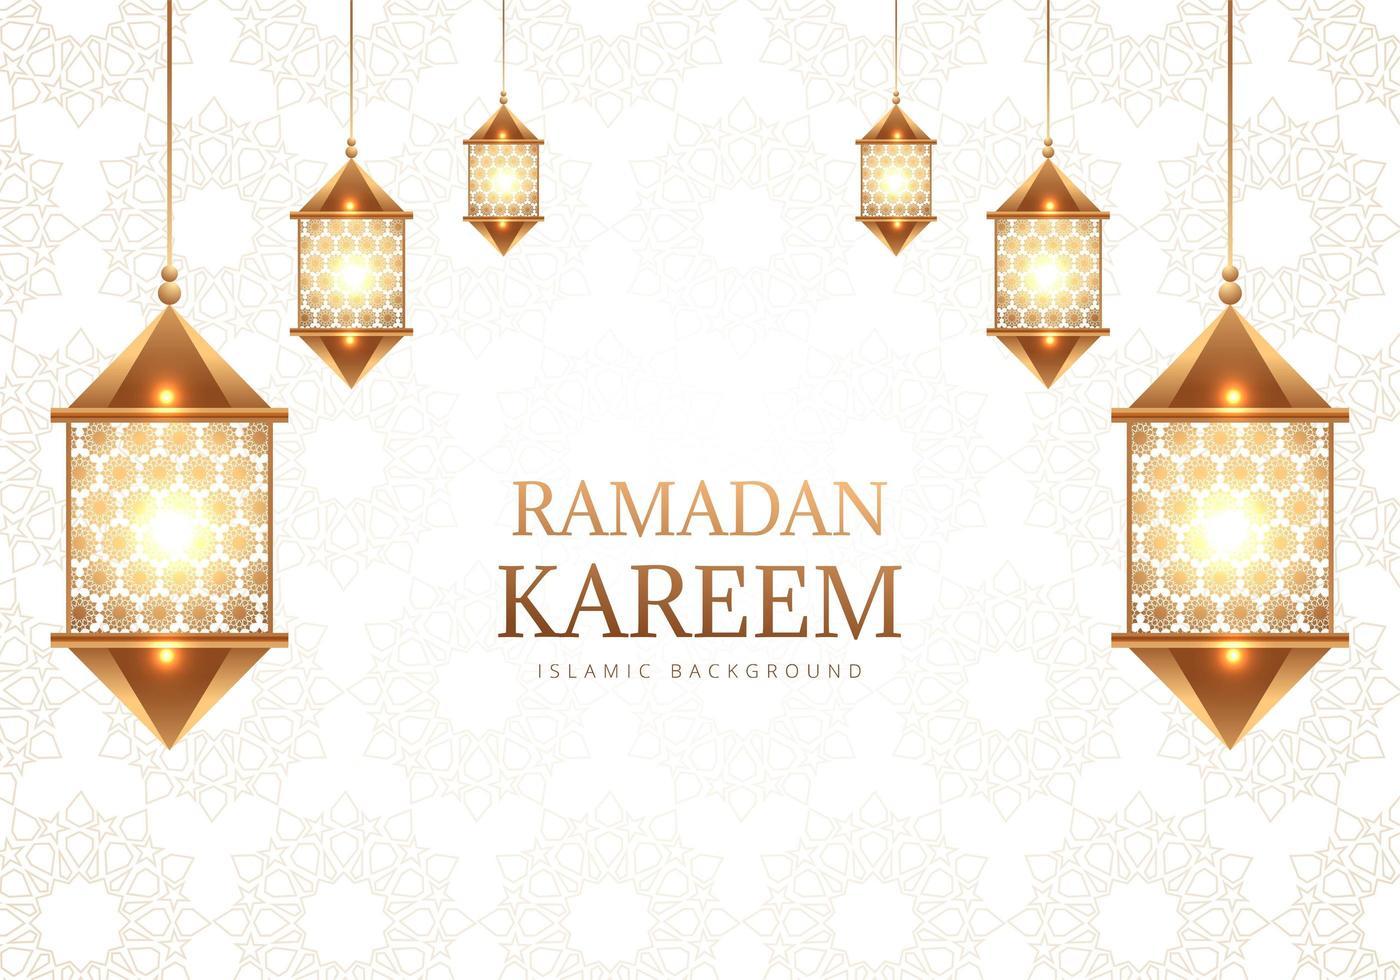 Ramadan Kareem lampade arabe decorative sul modello bianco vettore